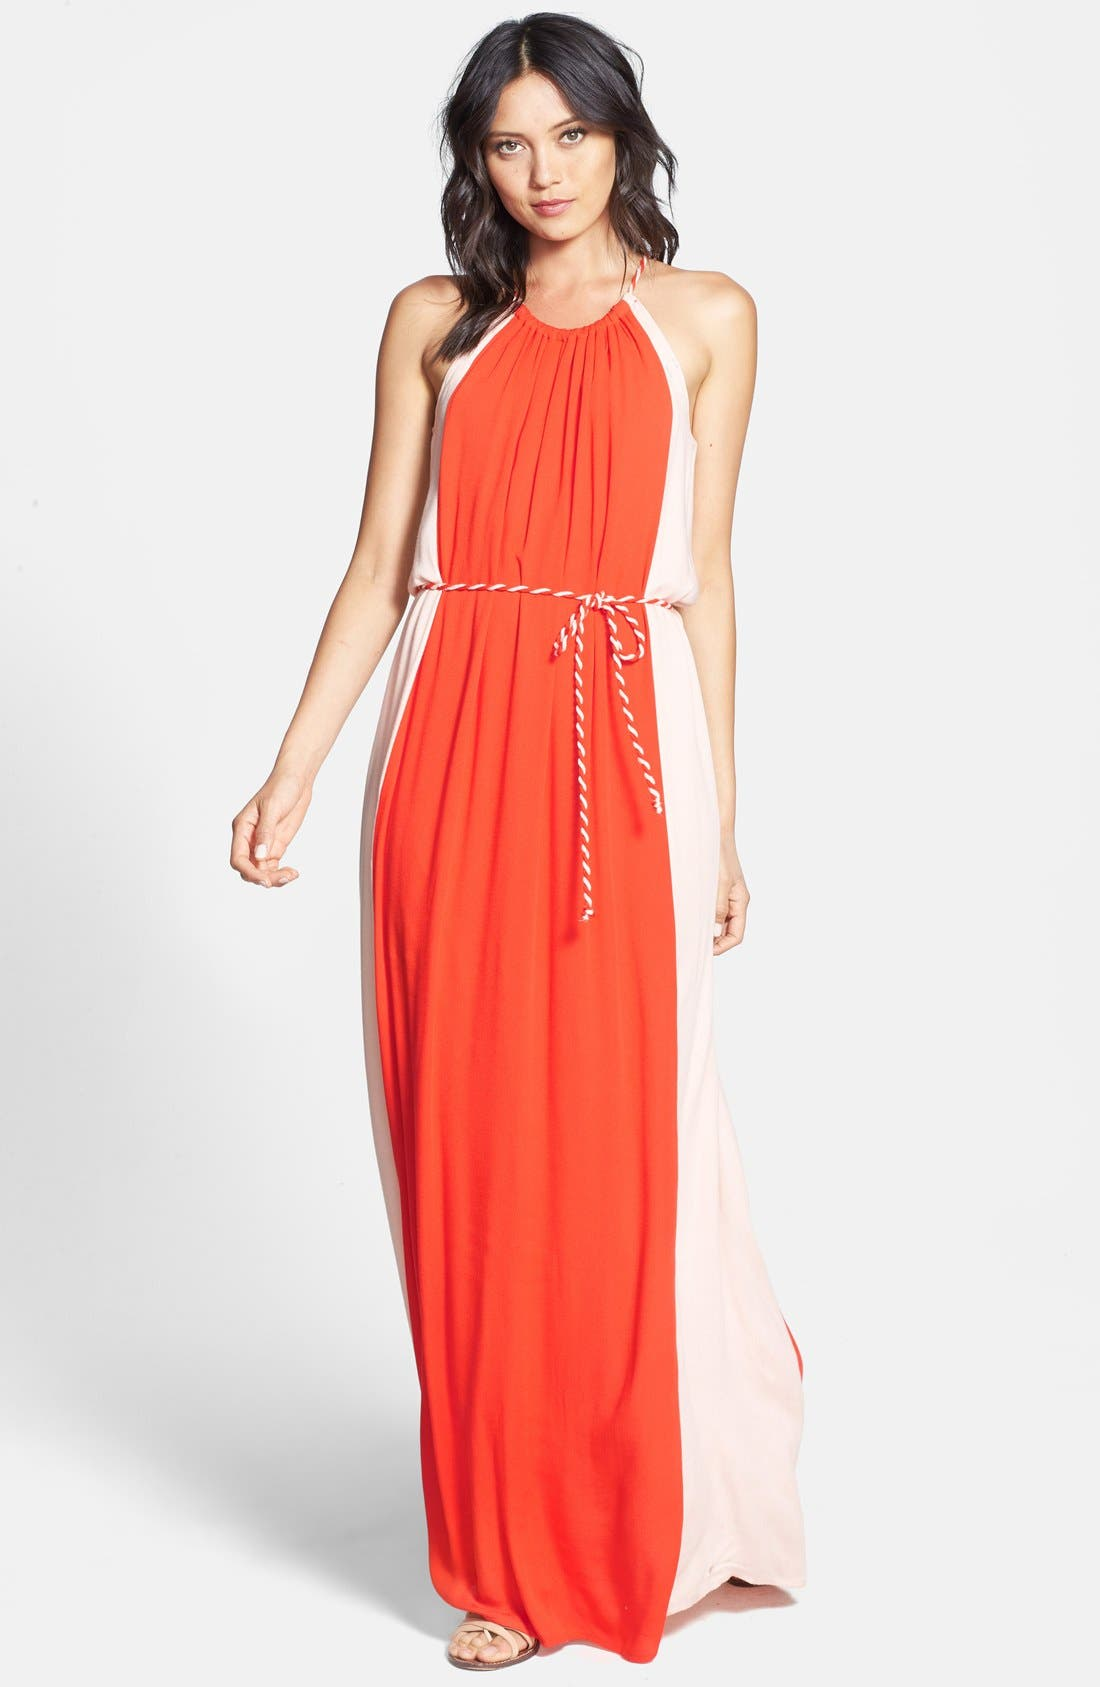 Main Image - Ella Moss 'Stella' Colorblock Maxi Dress